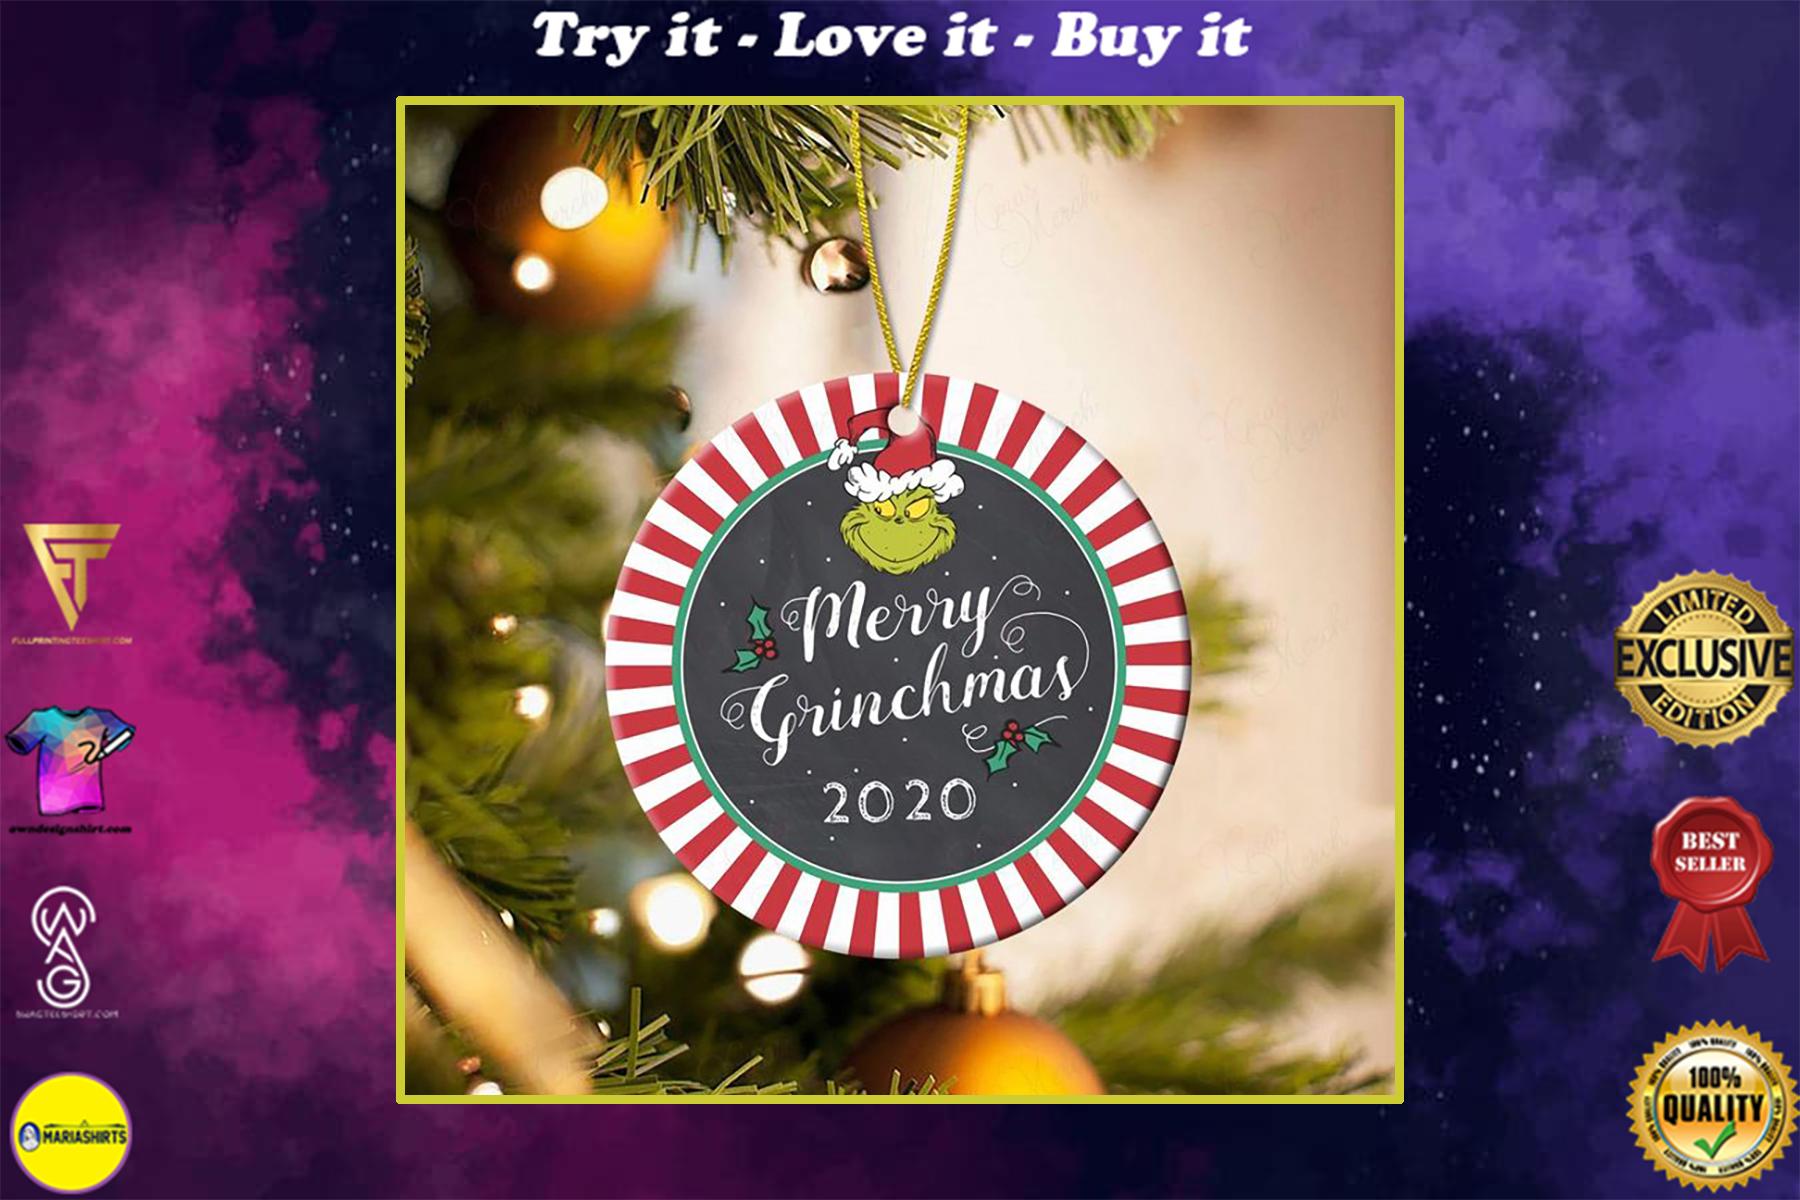 merry grinchmas 2020 christmas ornament